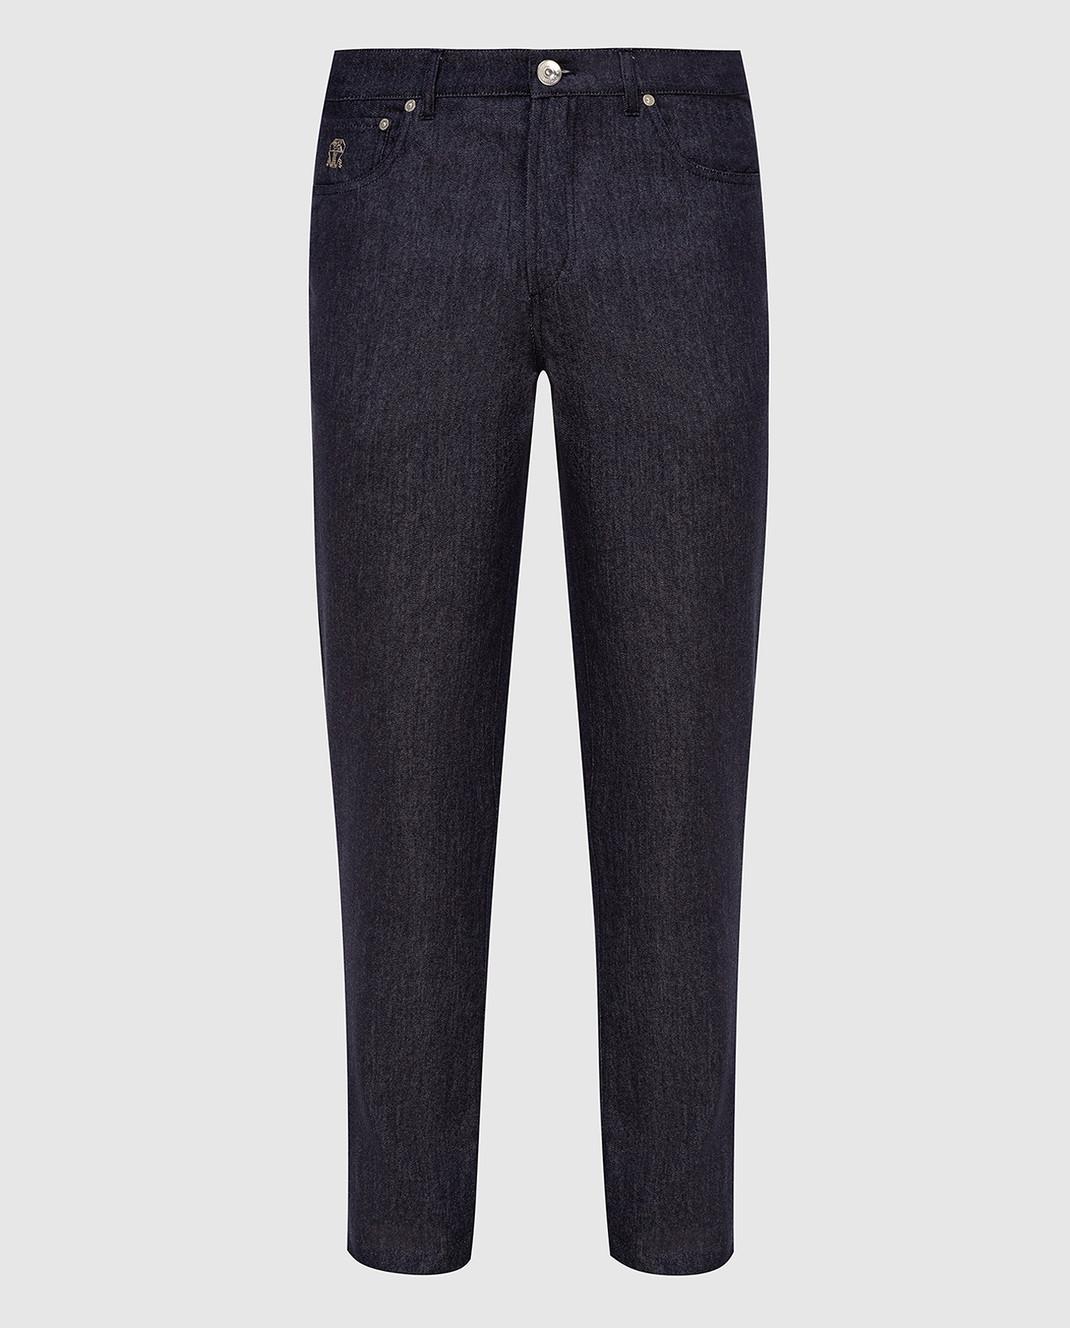 Brunello Cucinelli Темно-синие брюки из шерсти изображение 1